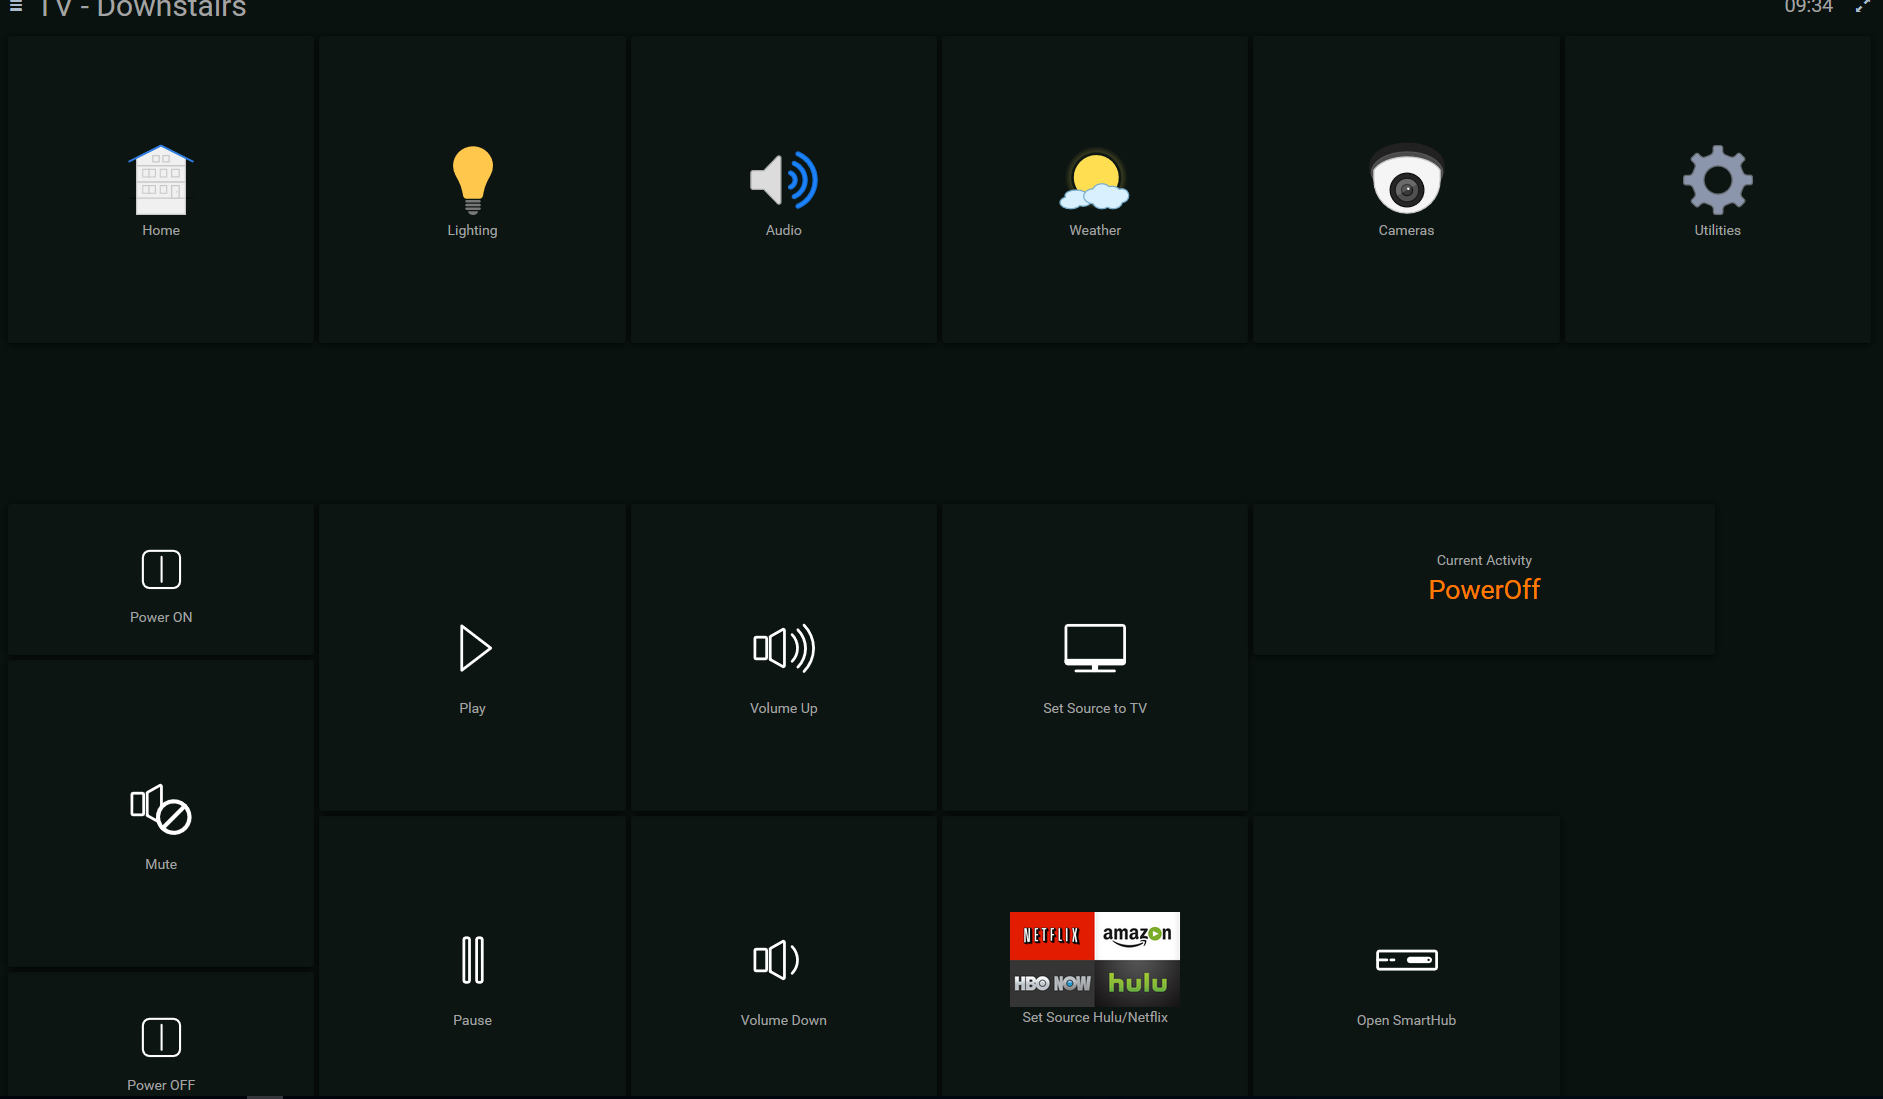 Unifi As Backbone for 100% Automated Smarthome | Ubiquiti Community